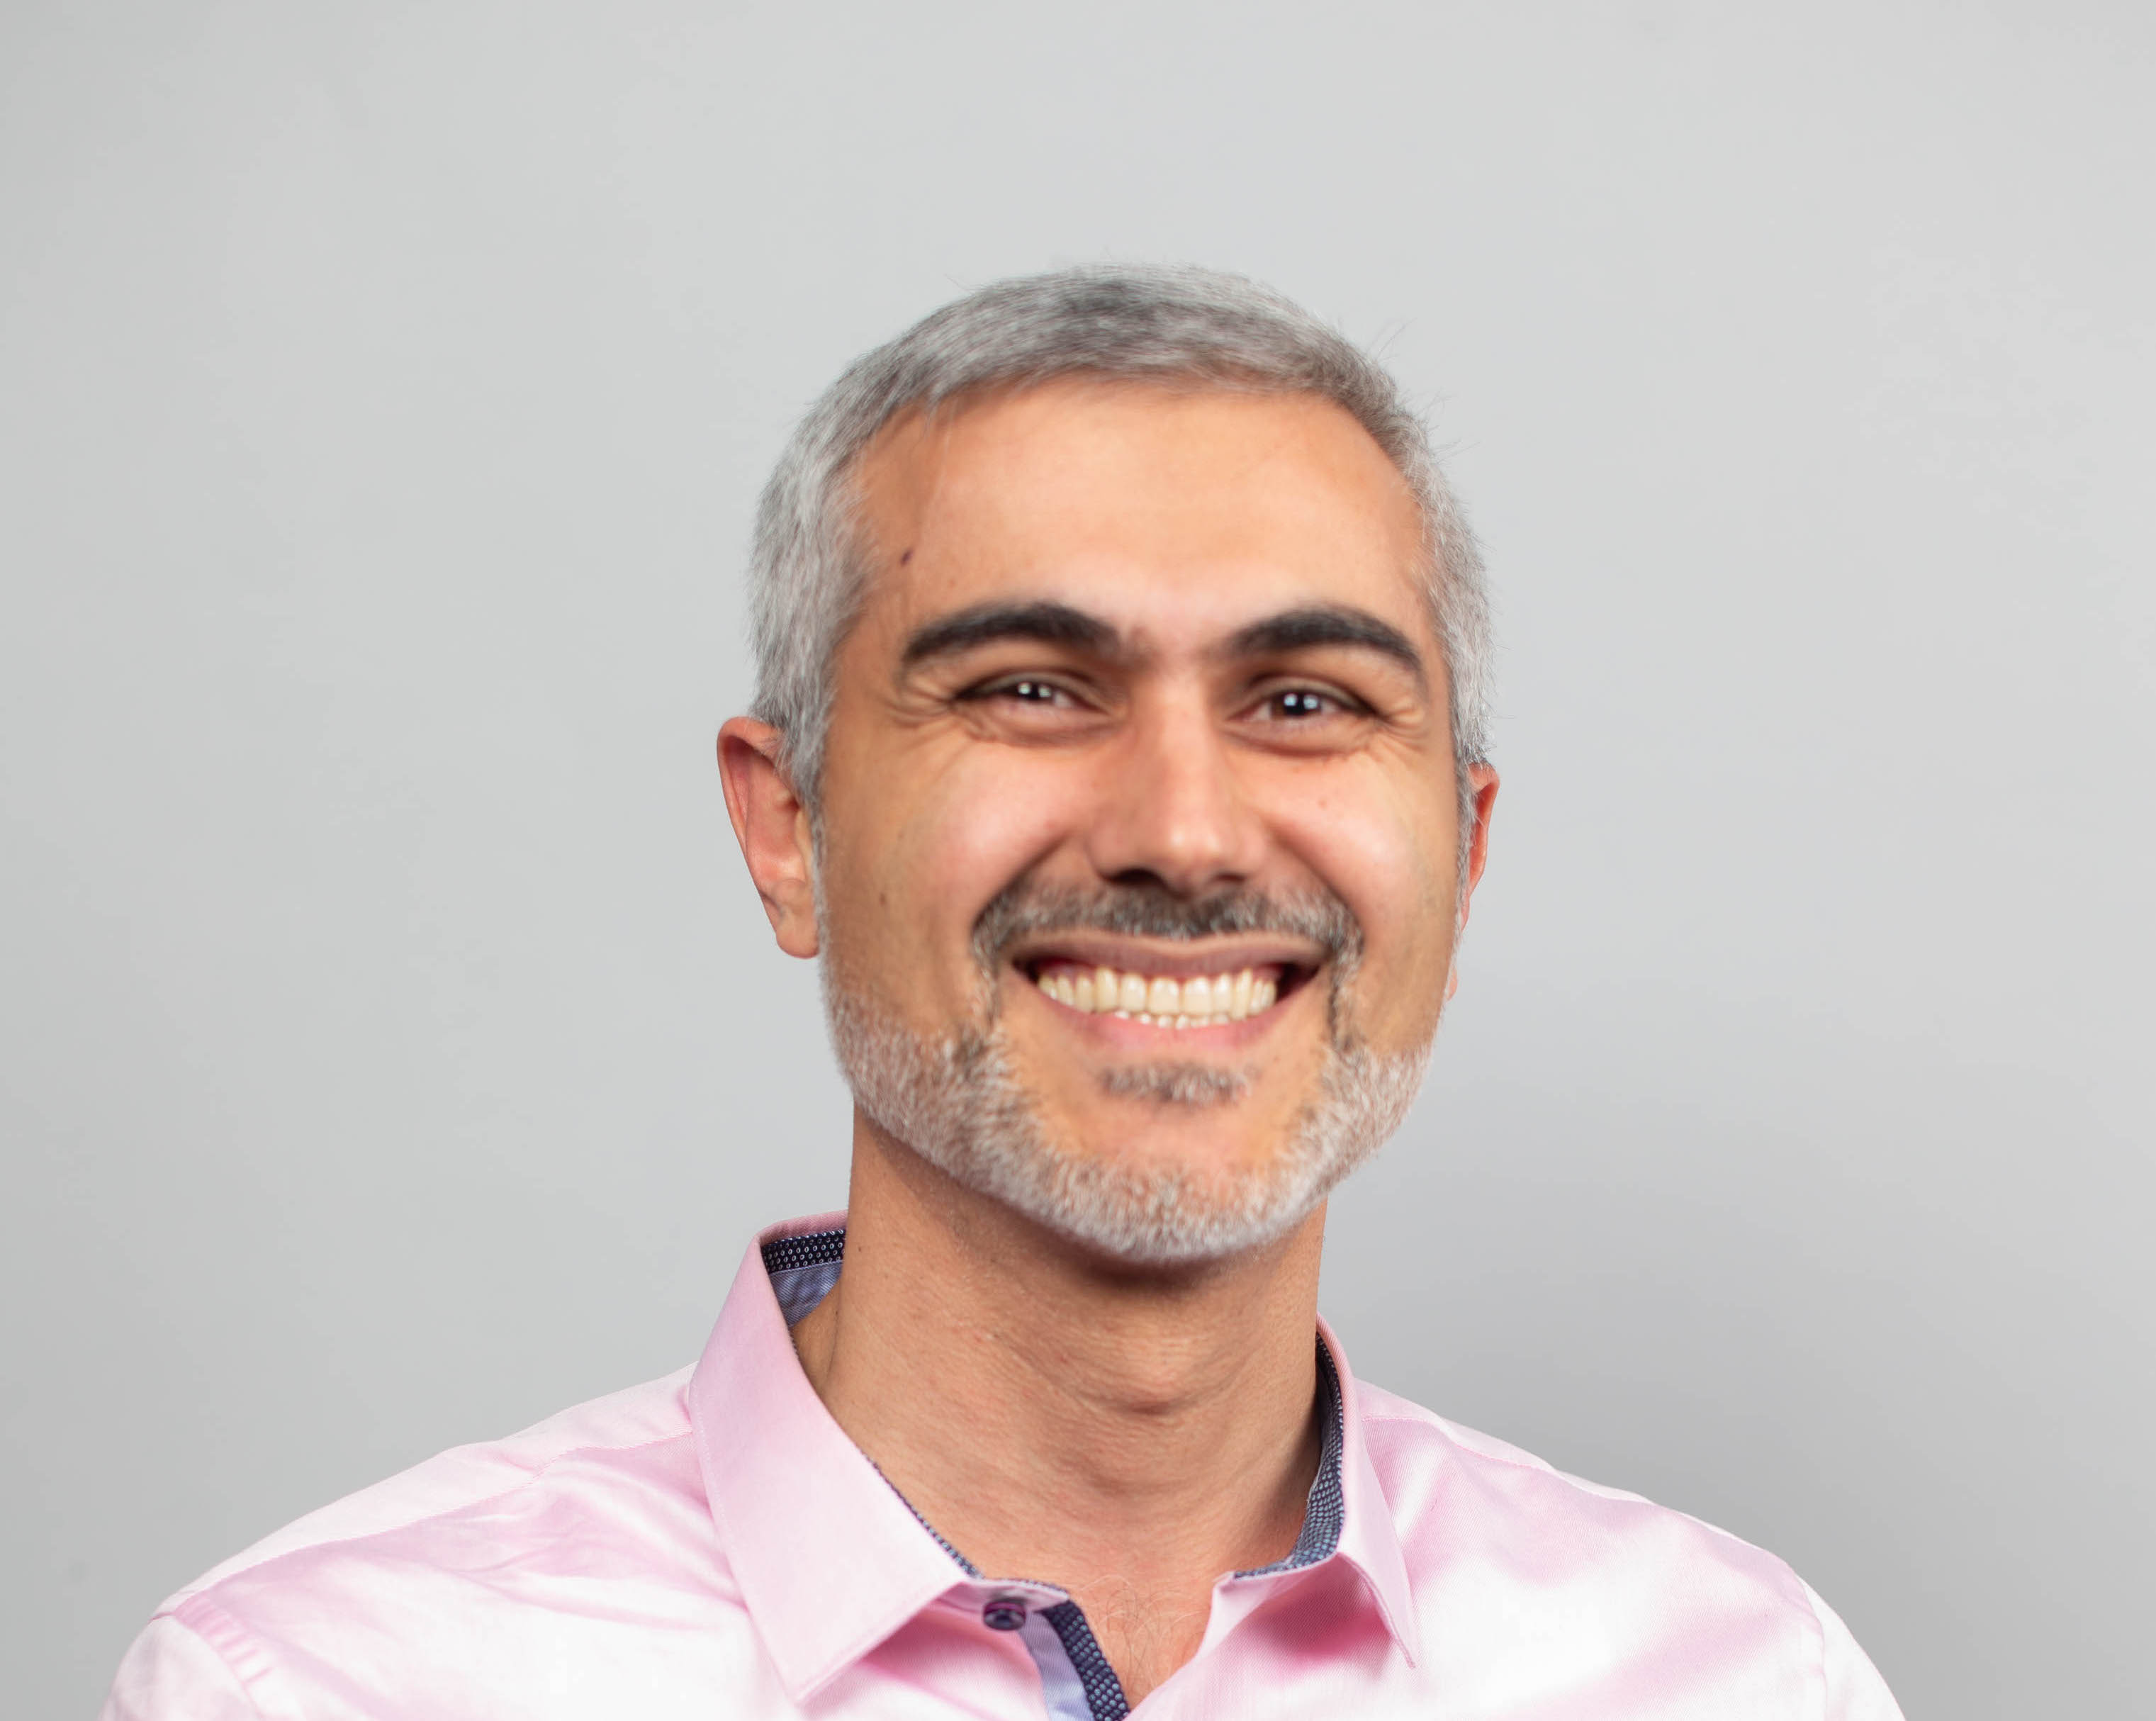 Mojtaba Hosseini